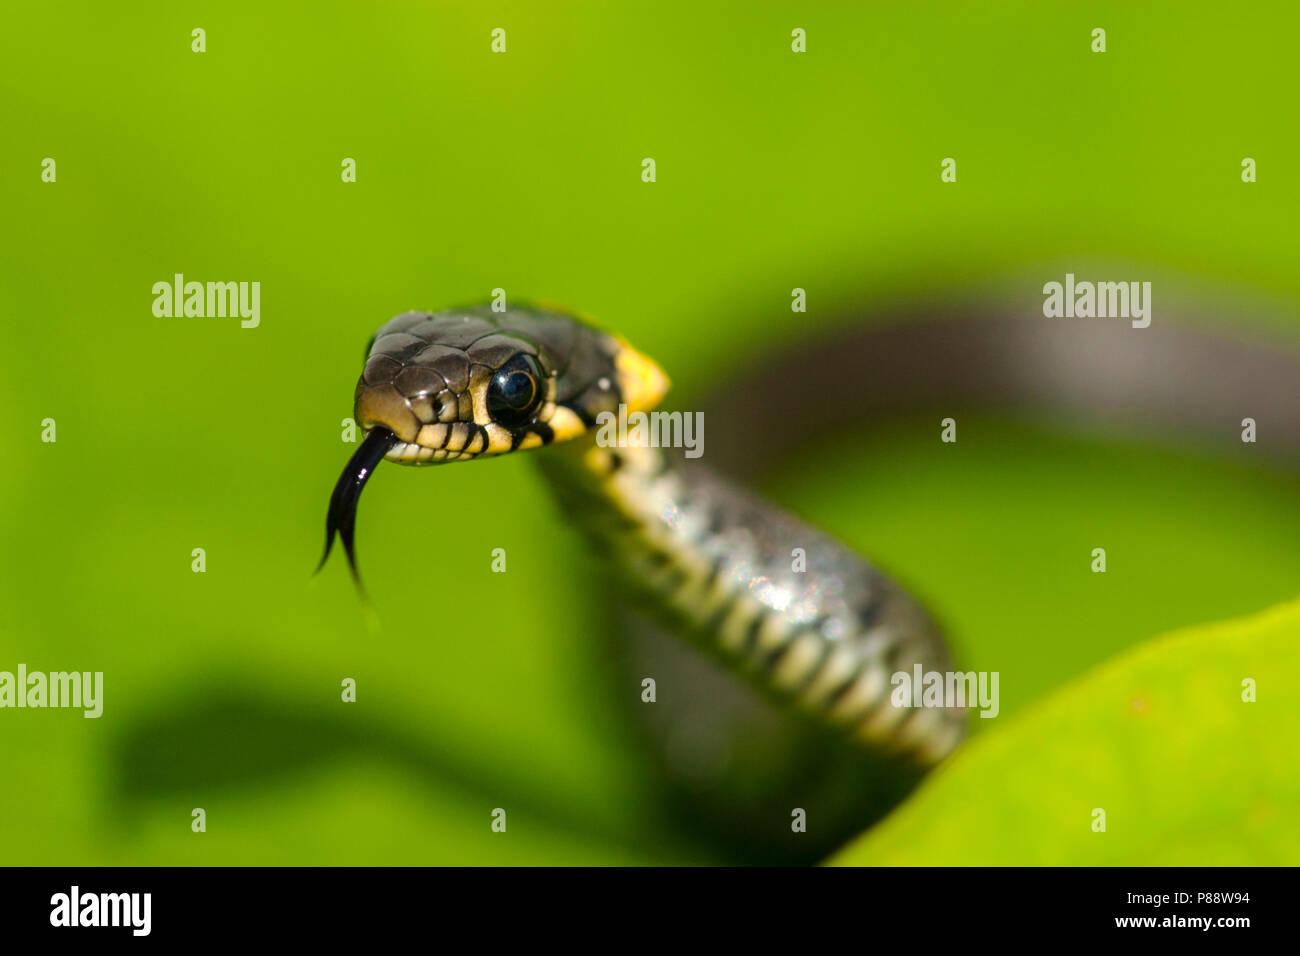 Ringslang, European Grass Snak, Natrix natrix Stock Photo